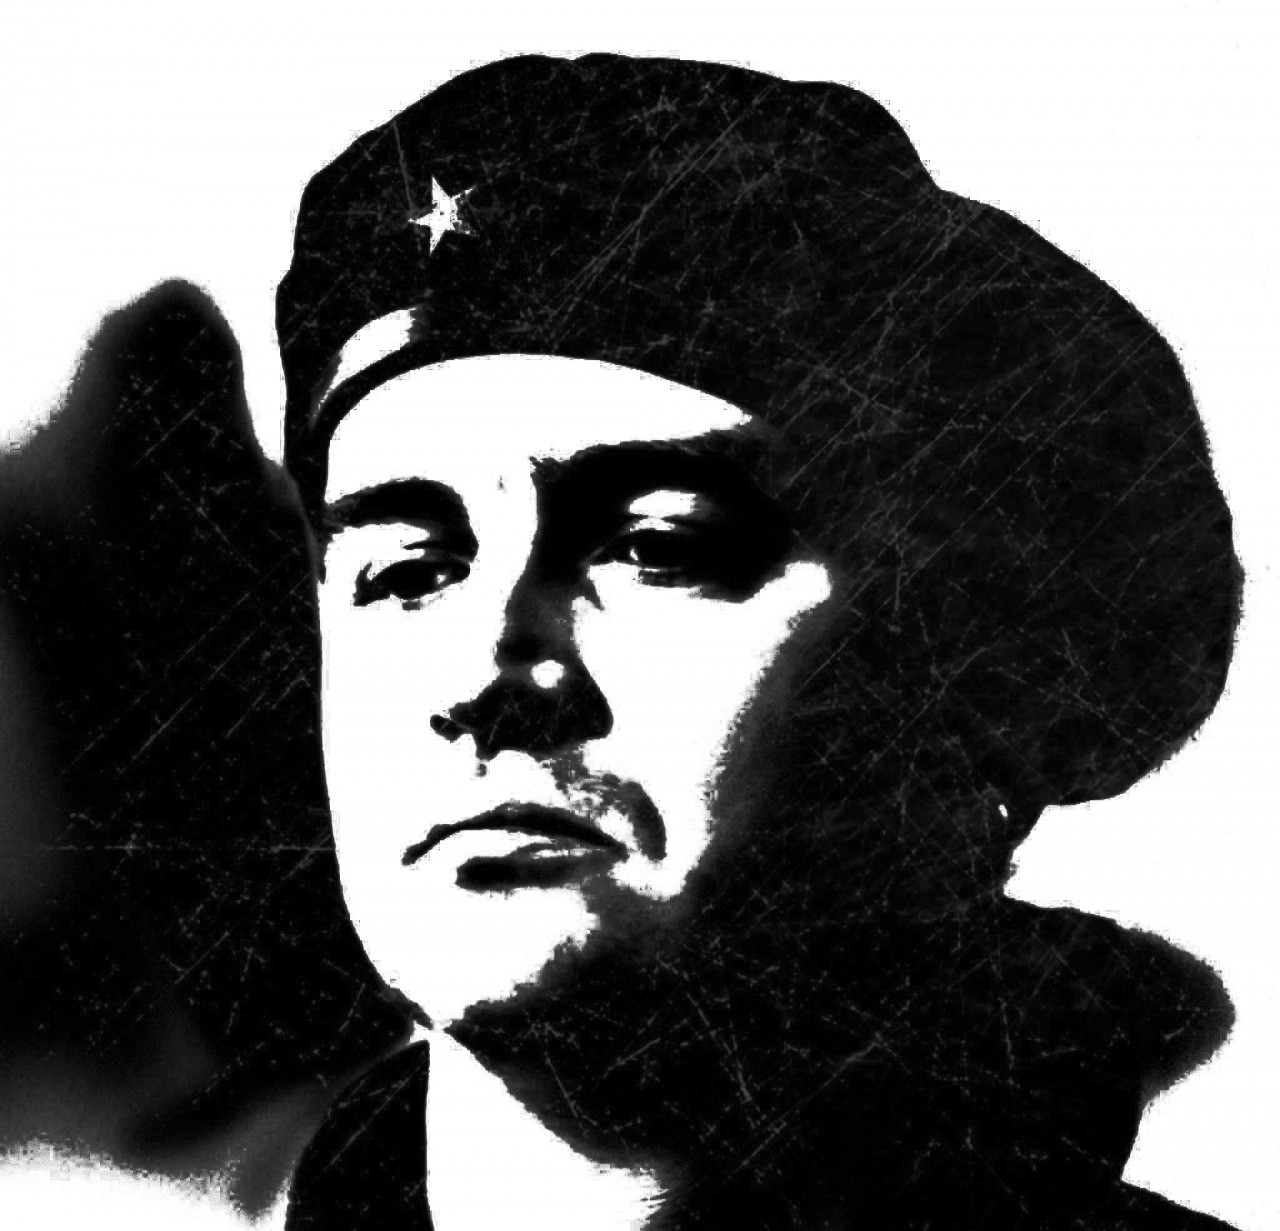 Александр Роджерс: Я больше не революционер…